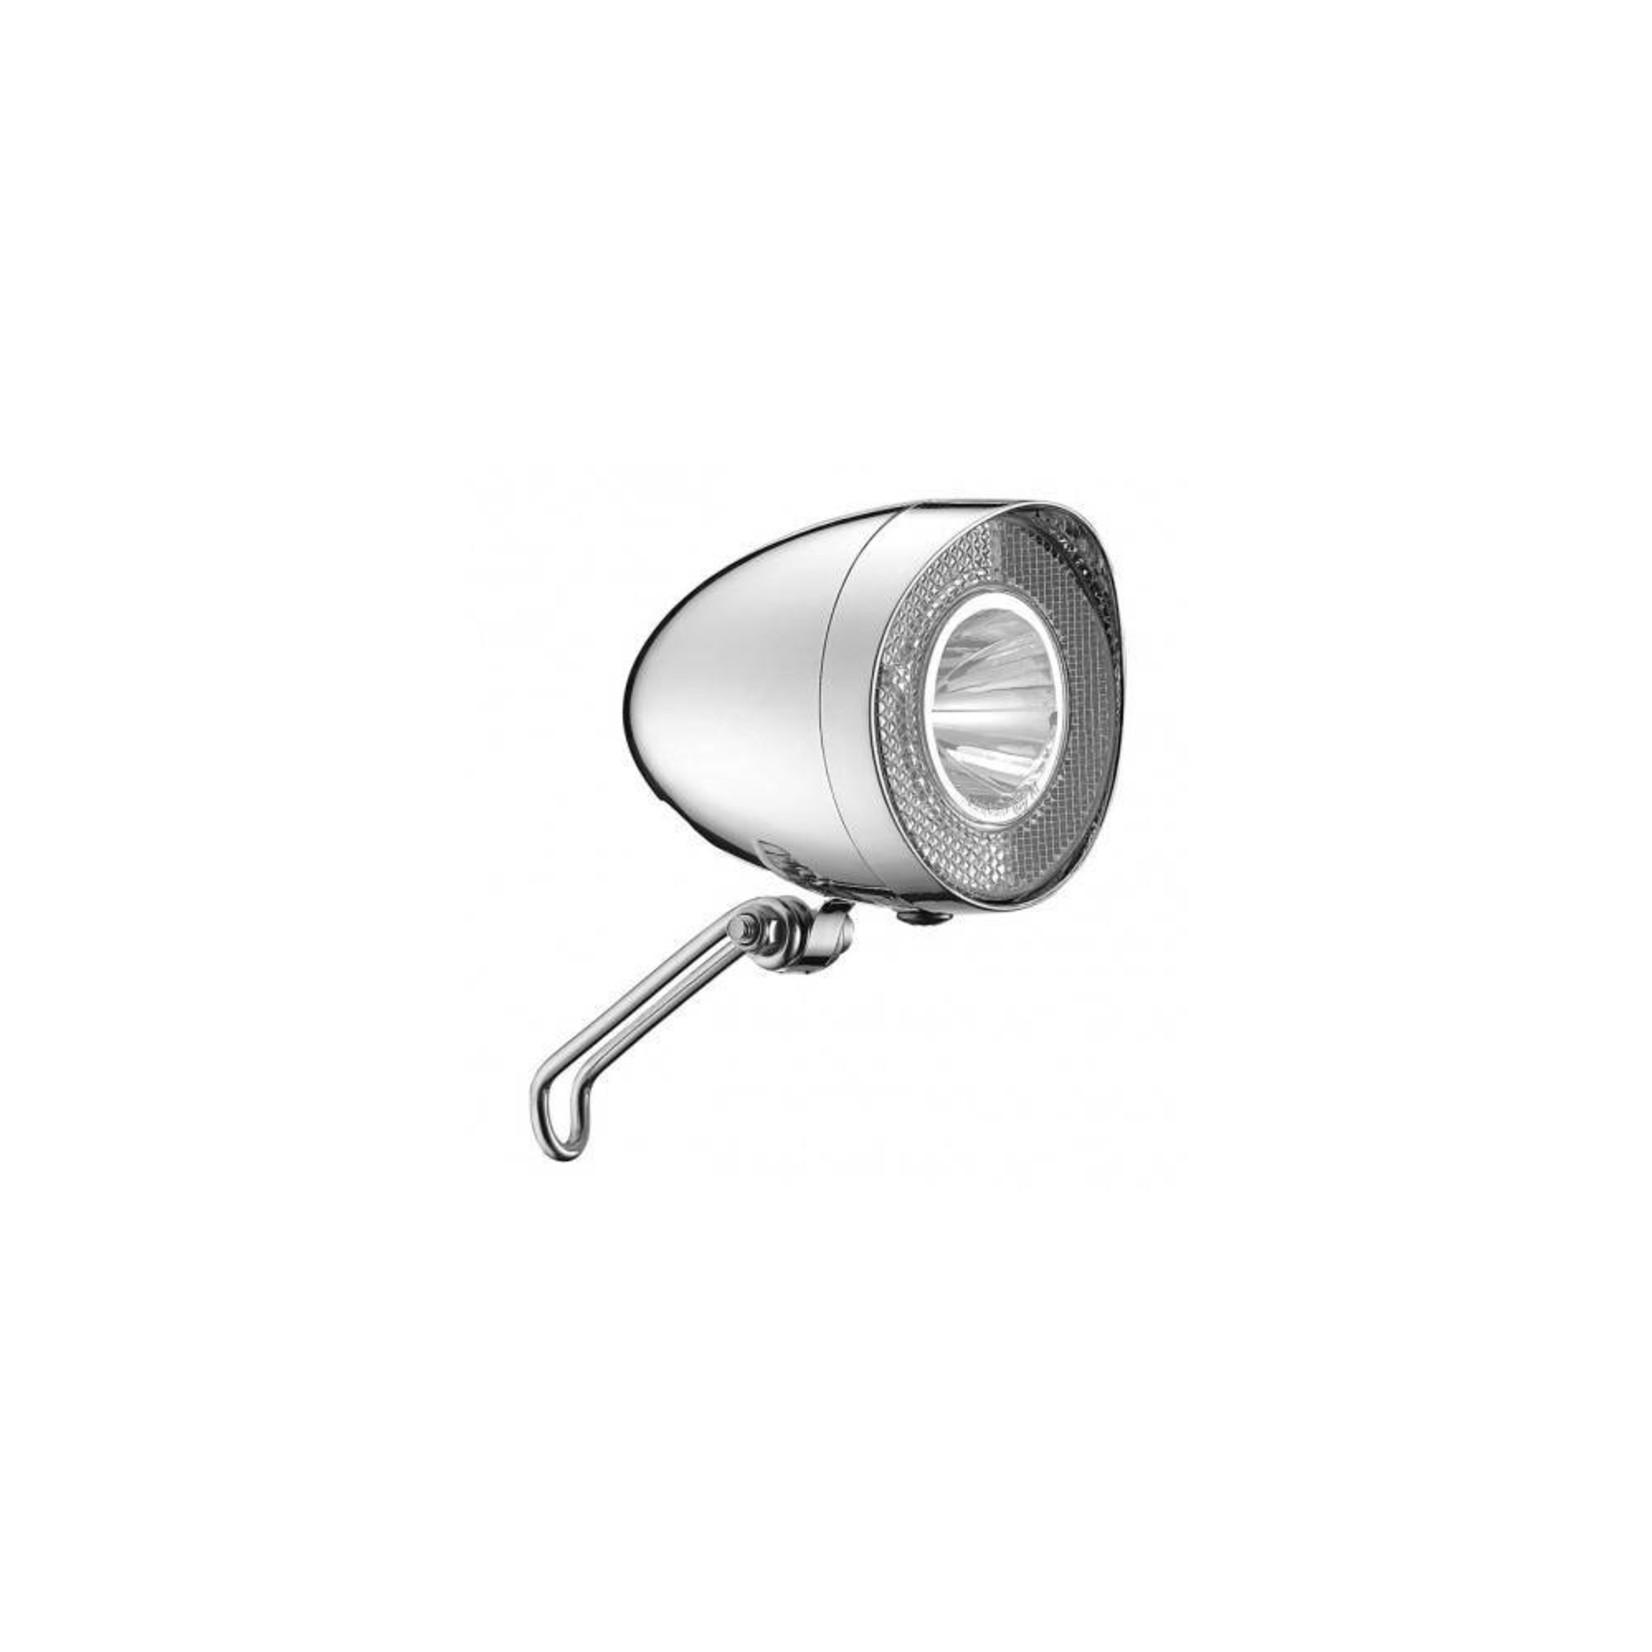 Union LED headlight